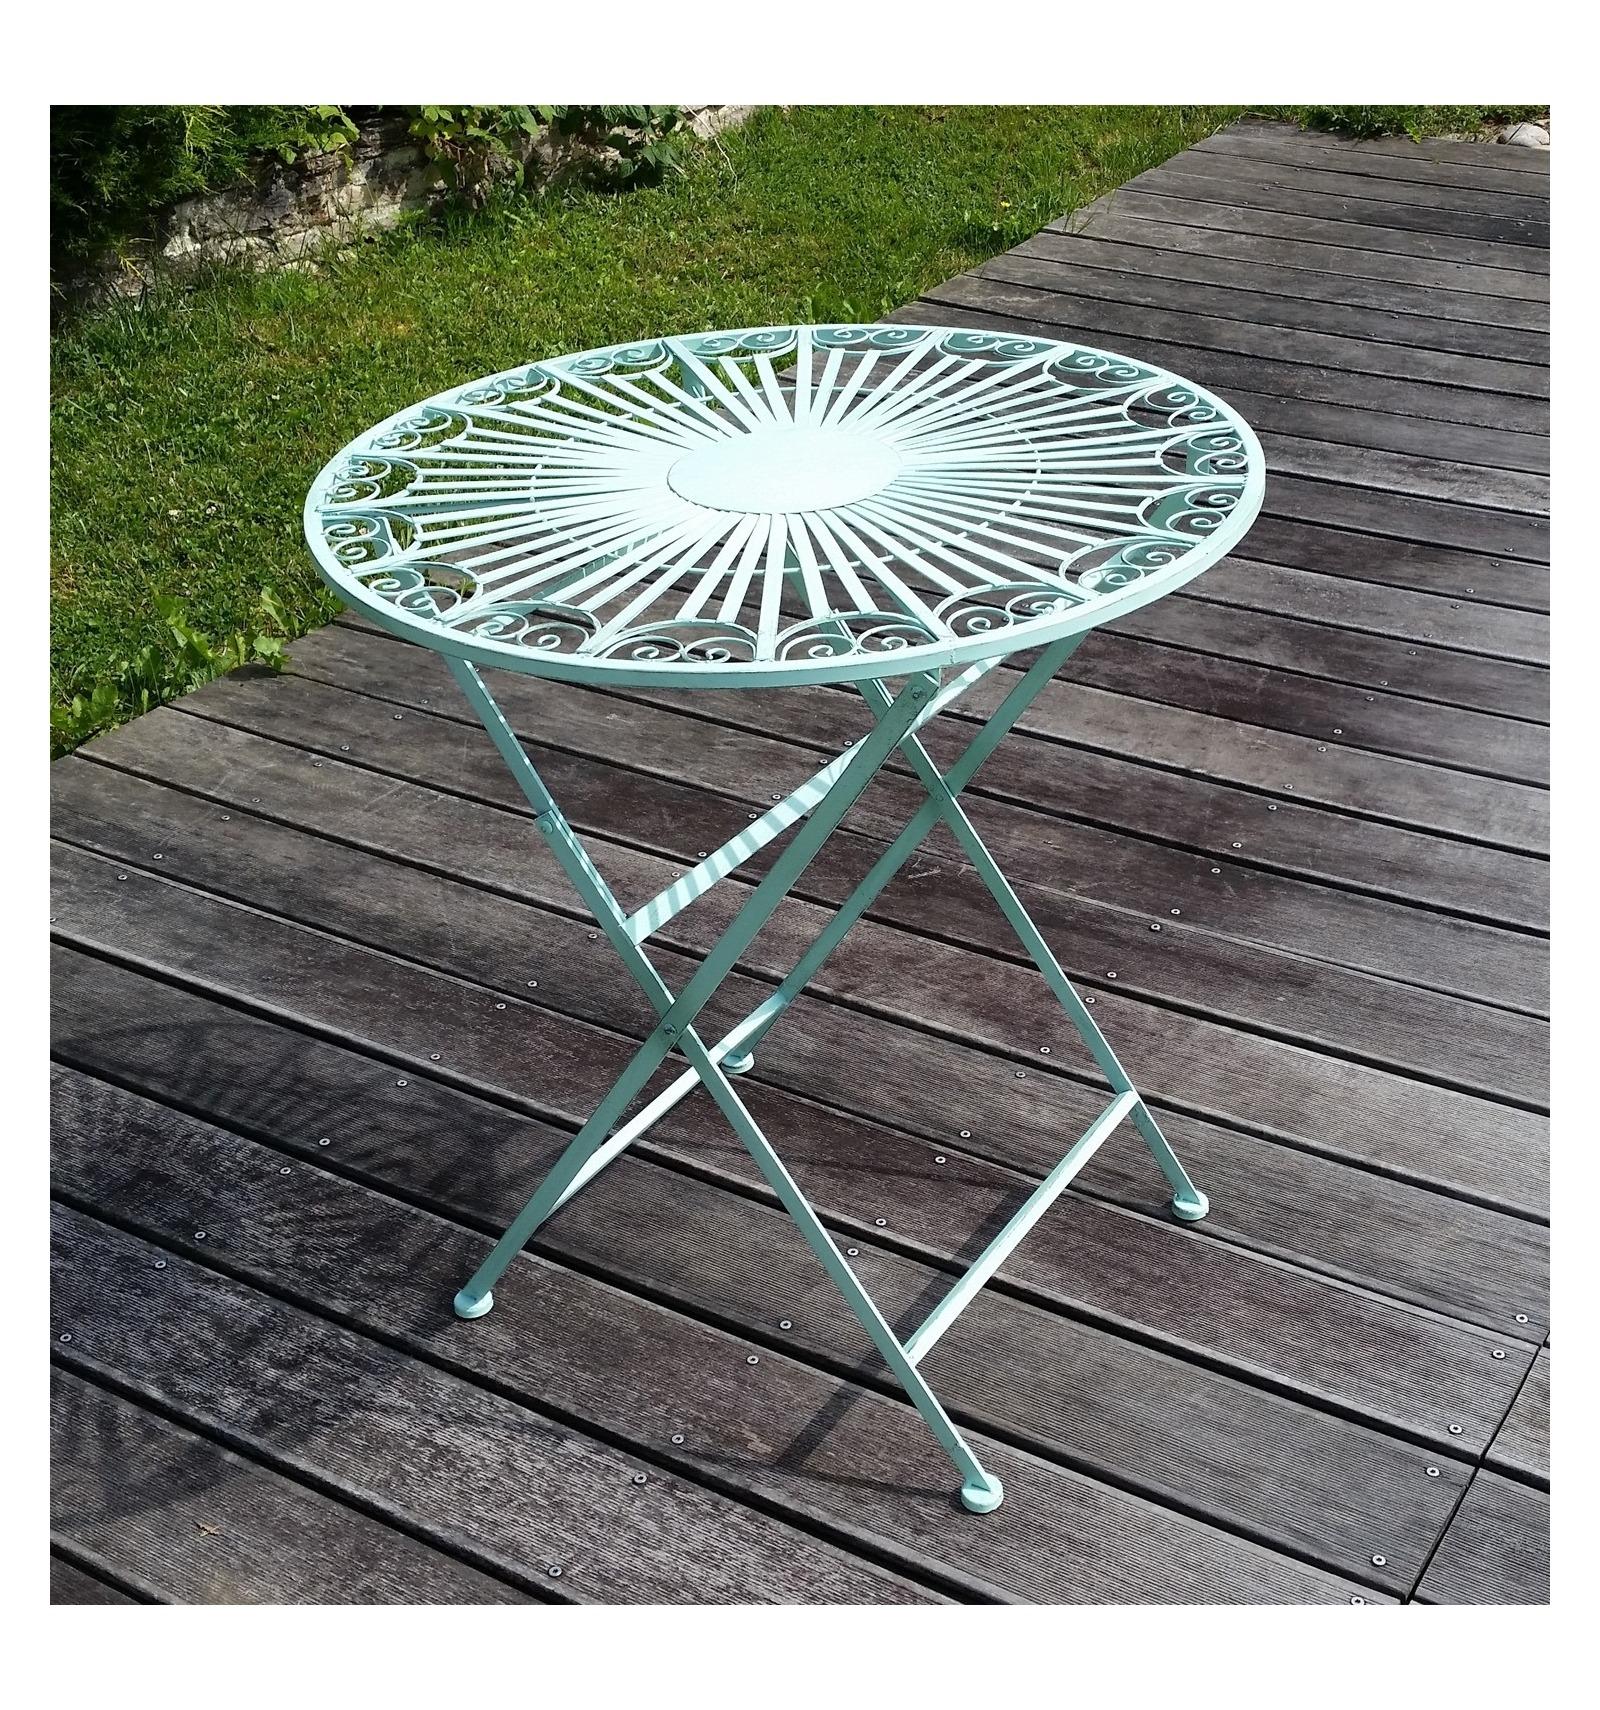 Giardino ferro battuto sedie e tavoli - Mobili da giardino in ferro ...